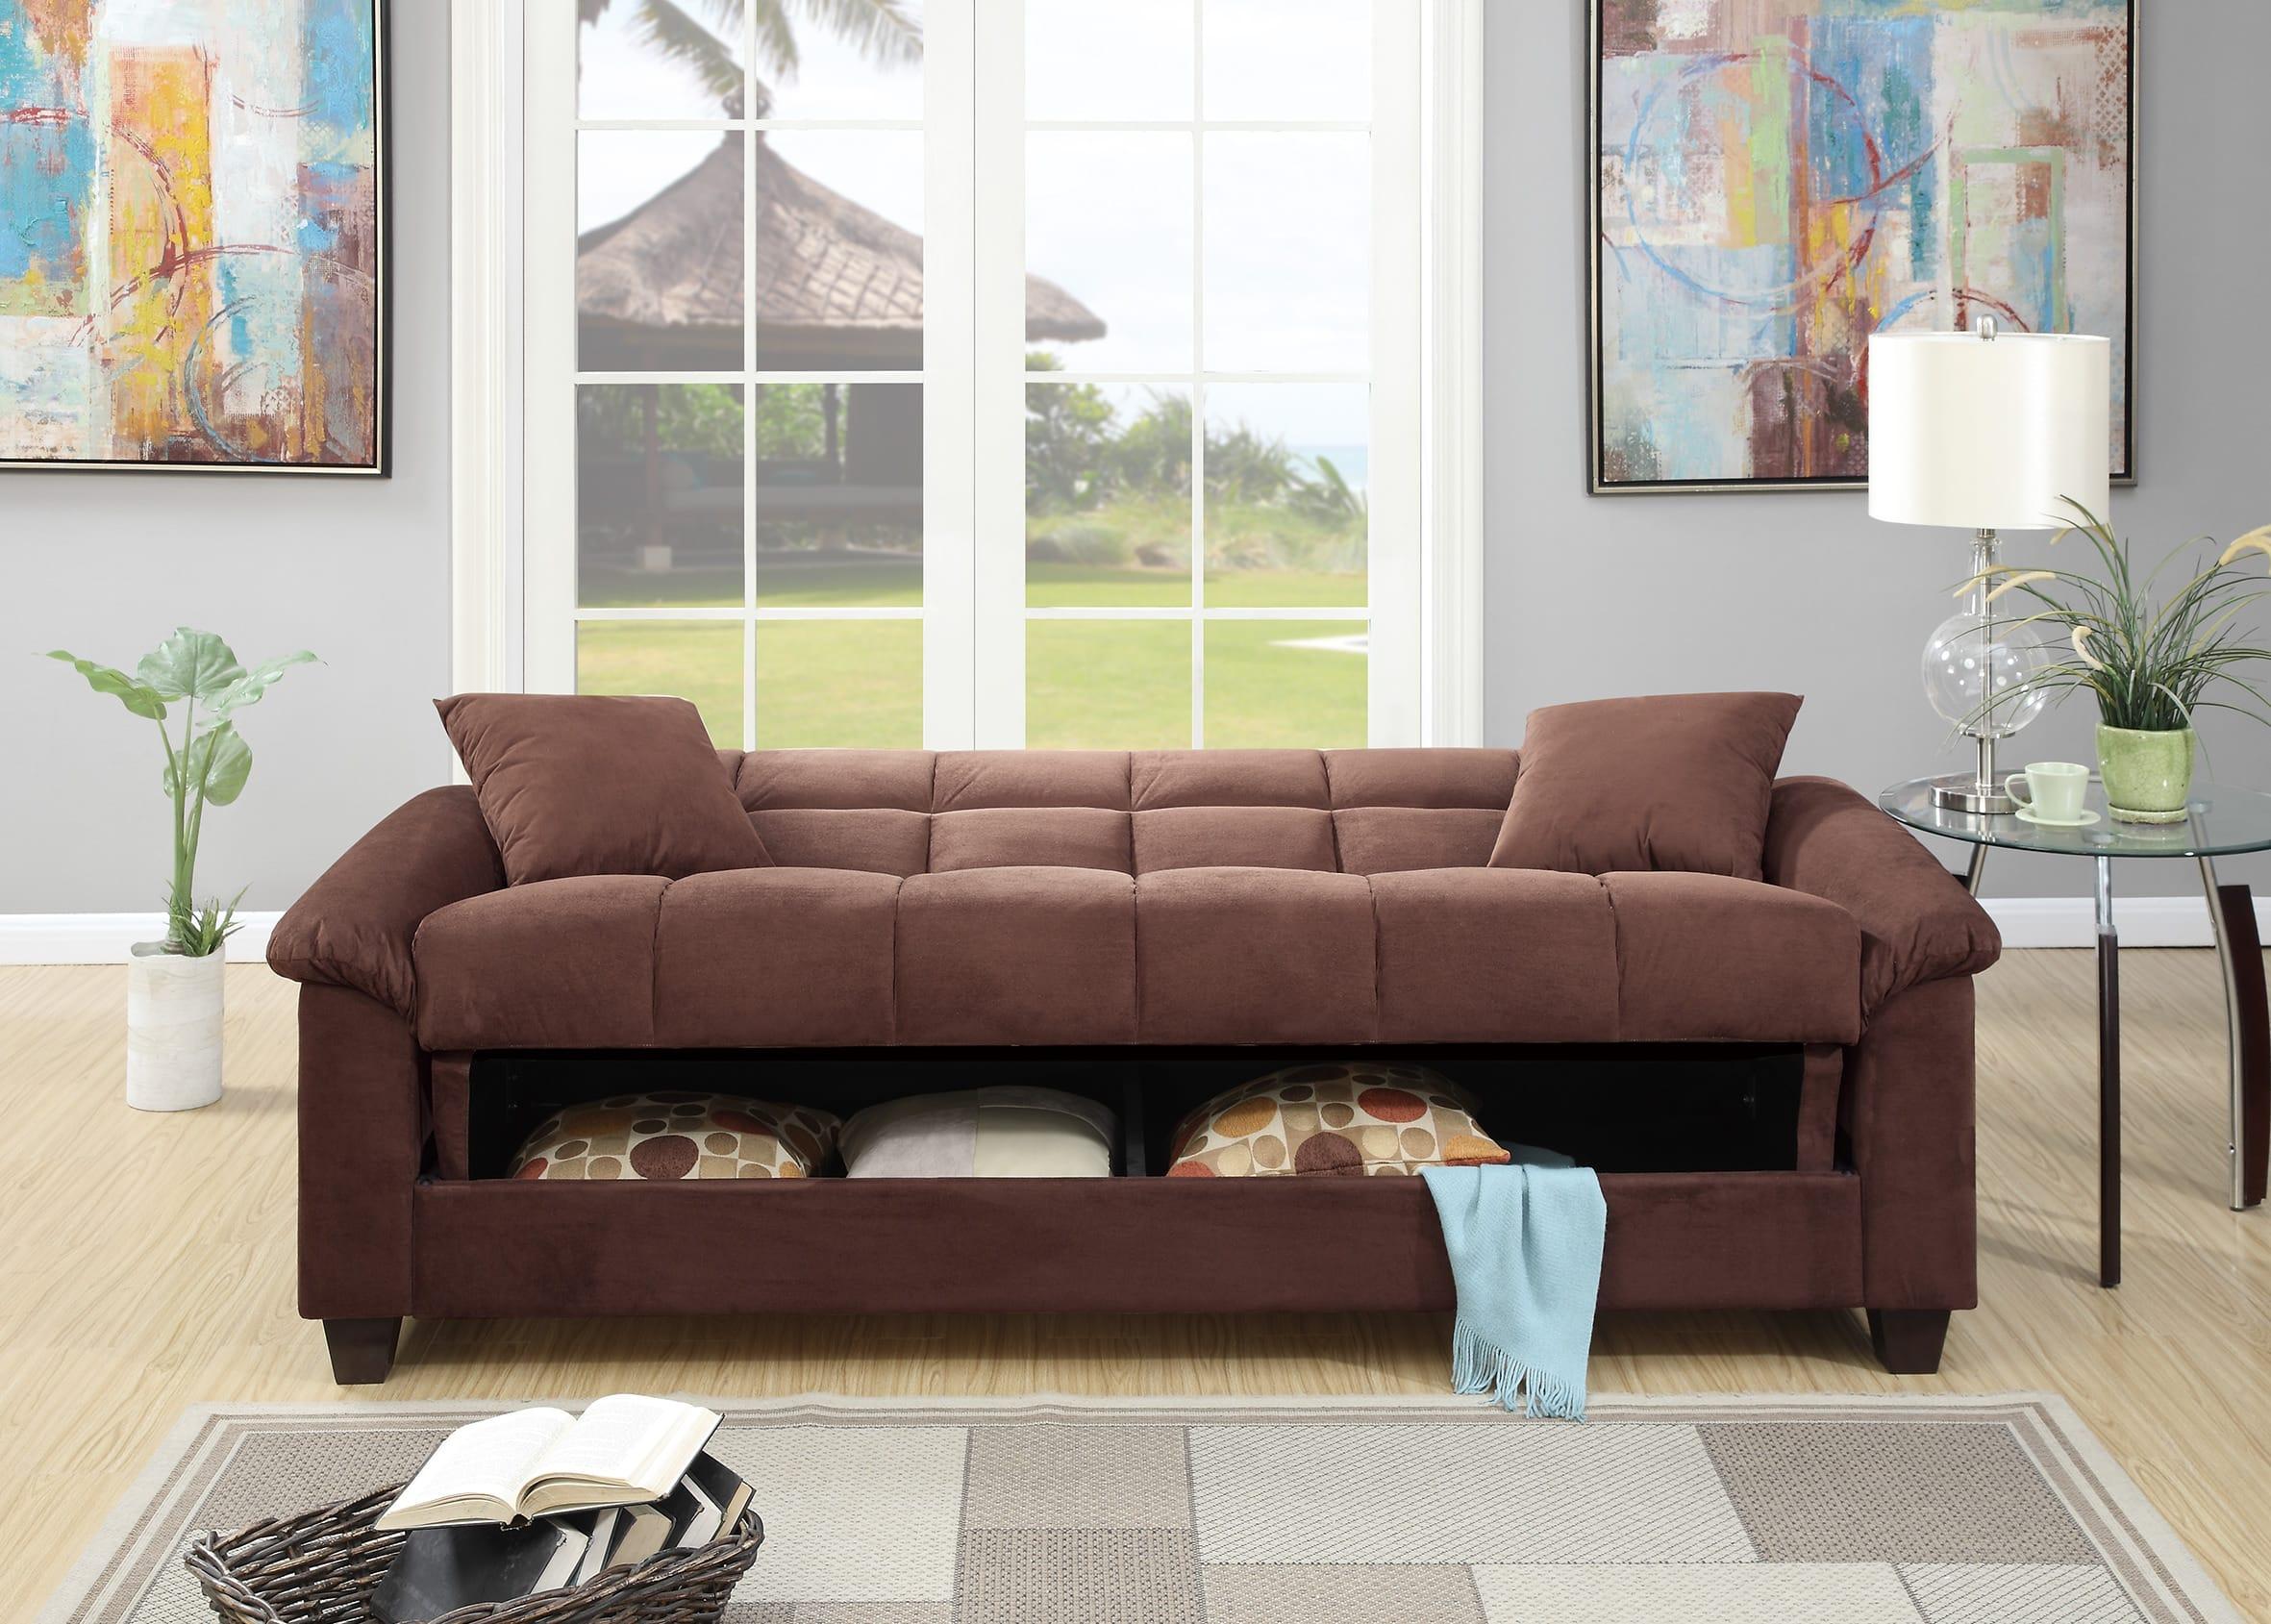 ace trading sofa mattress warehouse best interior furniture rh sdesigns co